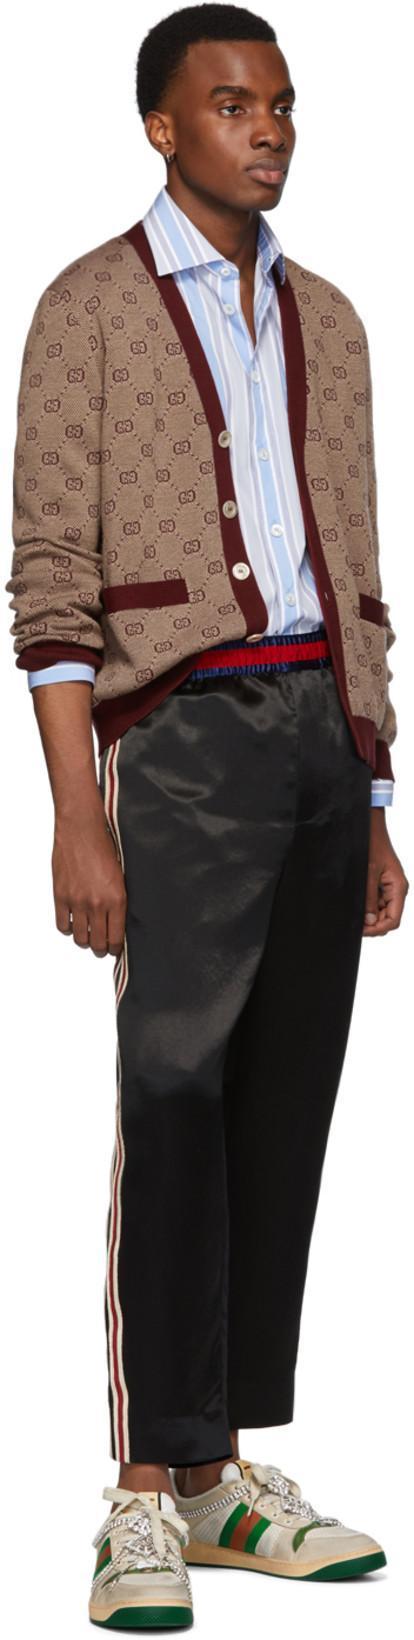 5ae0538715 Gucci Gg Jacquard Knit Cardigan In 9192 | ModeSens